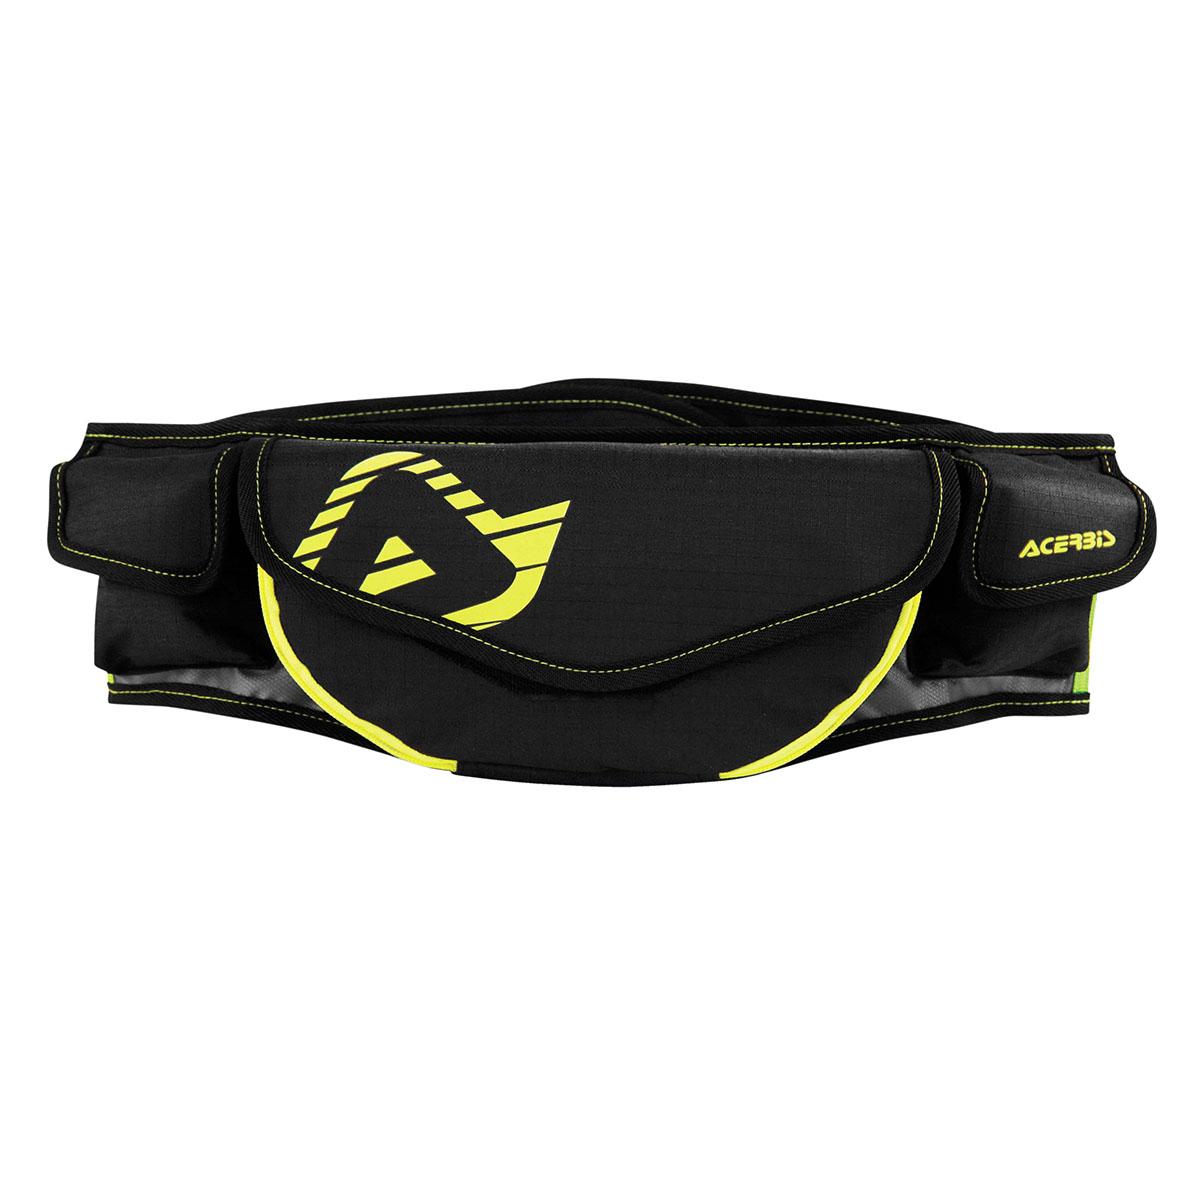 Acerbis Waist Bag Ram Black/Fluo Yellow